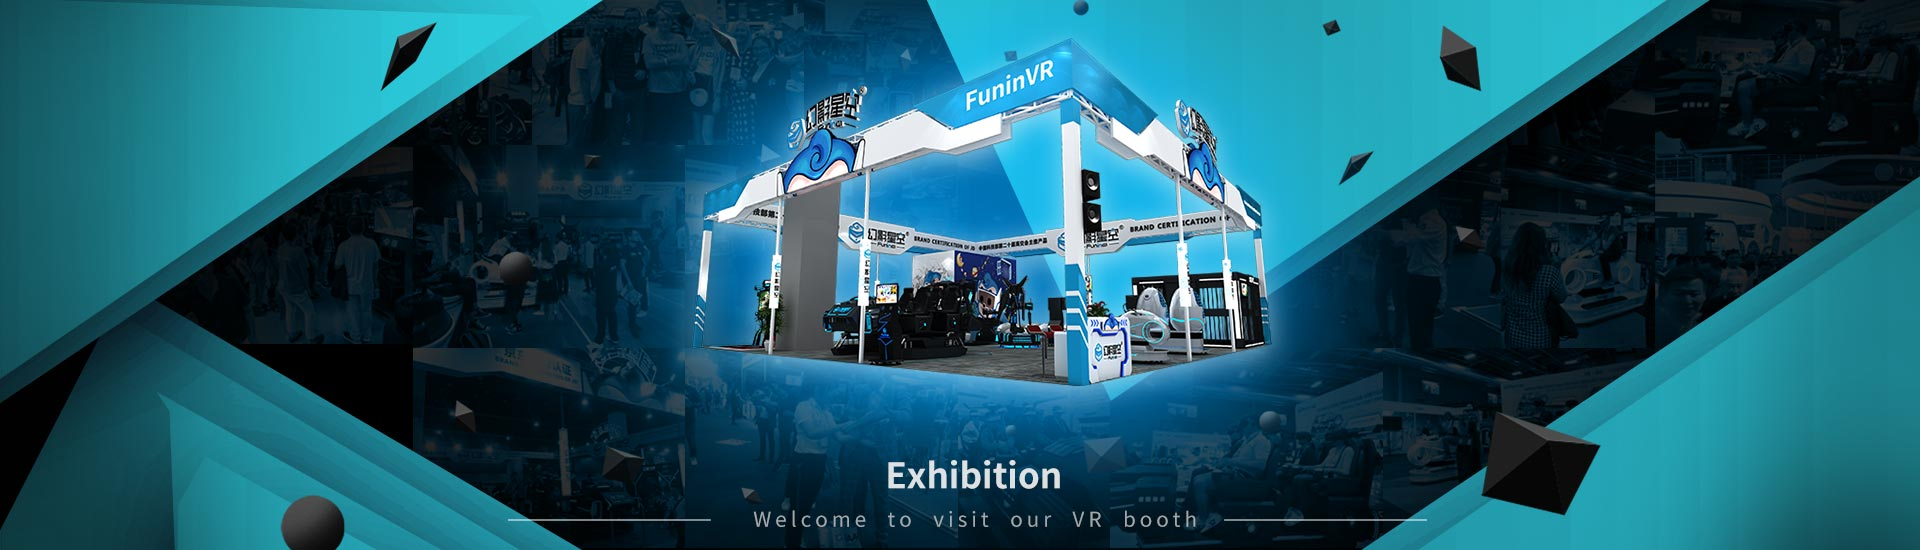 GTI 2020 Asia China Expo, feria asiática de realidad virtual